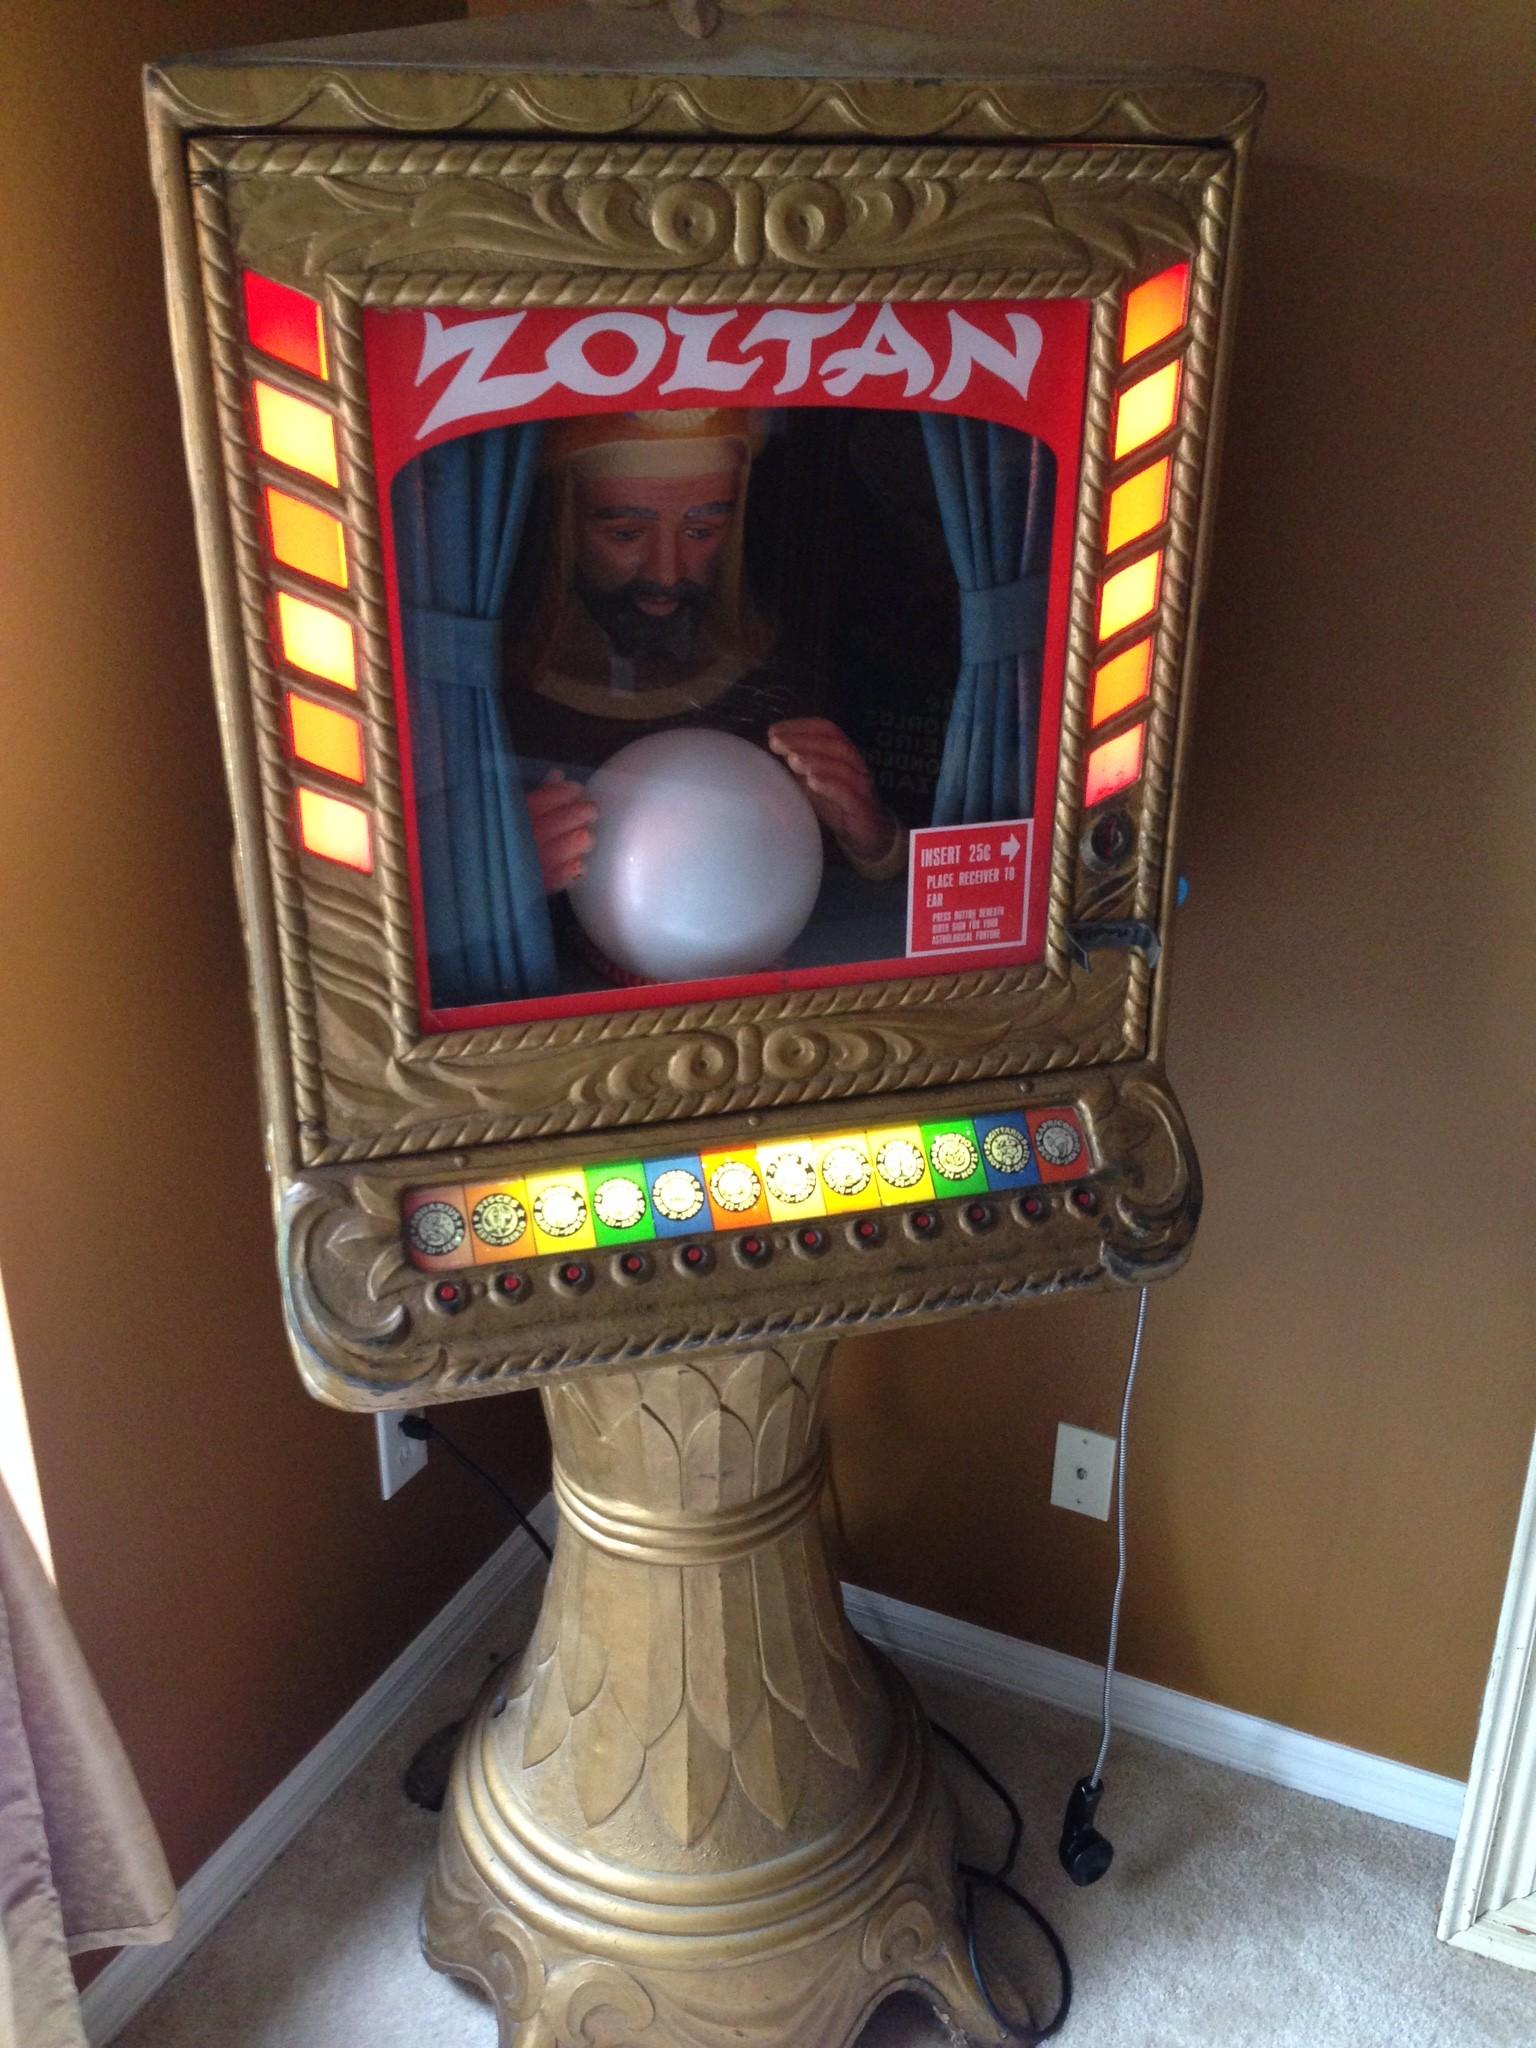 Zoltan Penny Arcade Fortune Teller Machine  Obnoxious